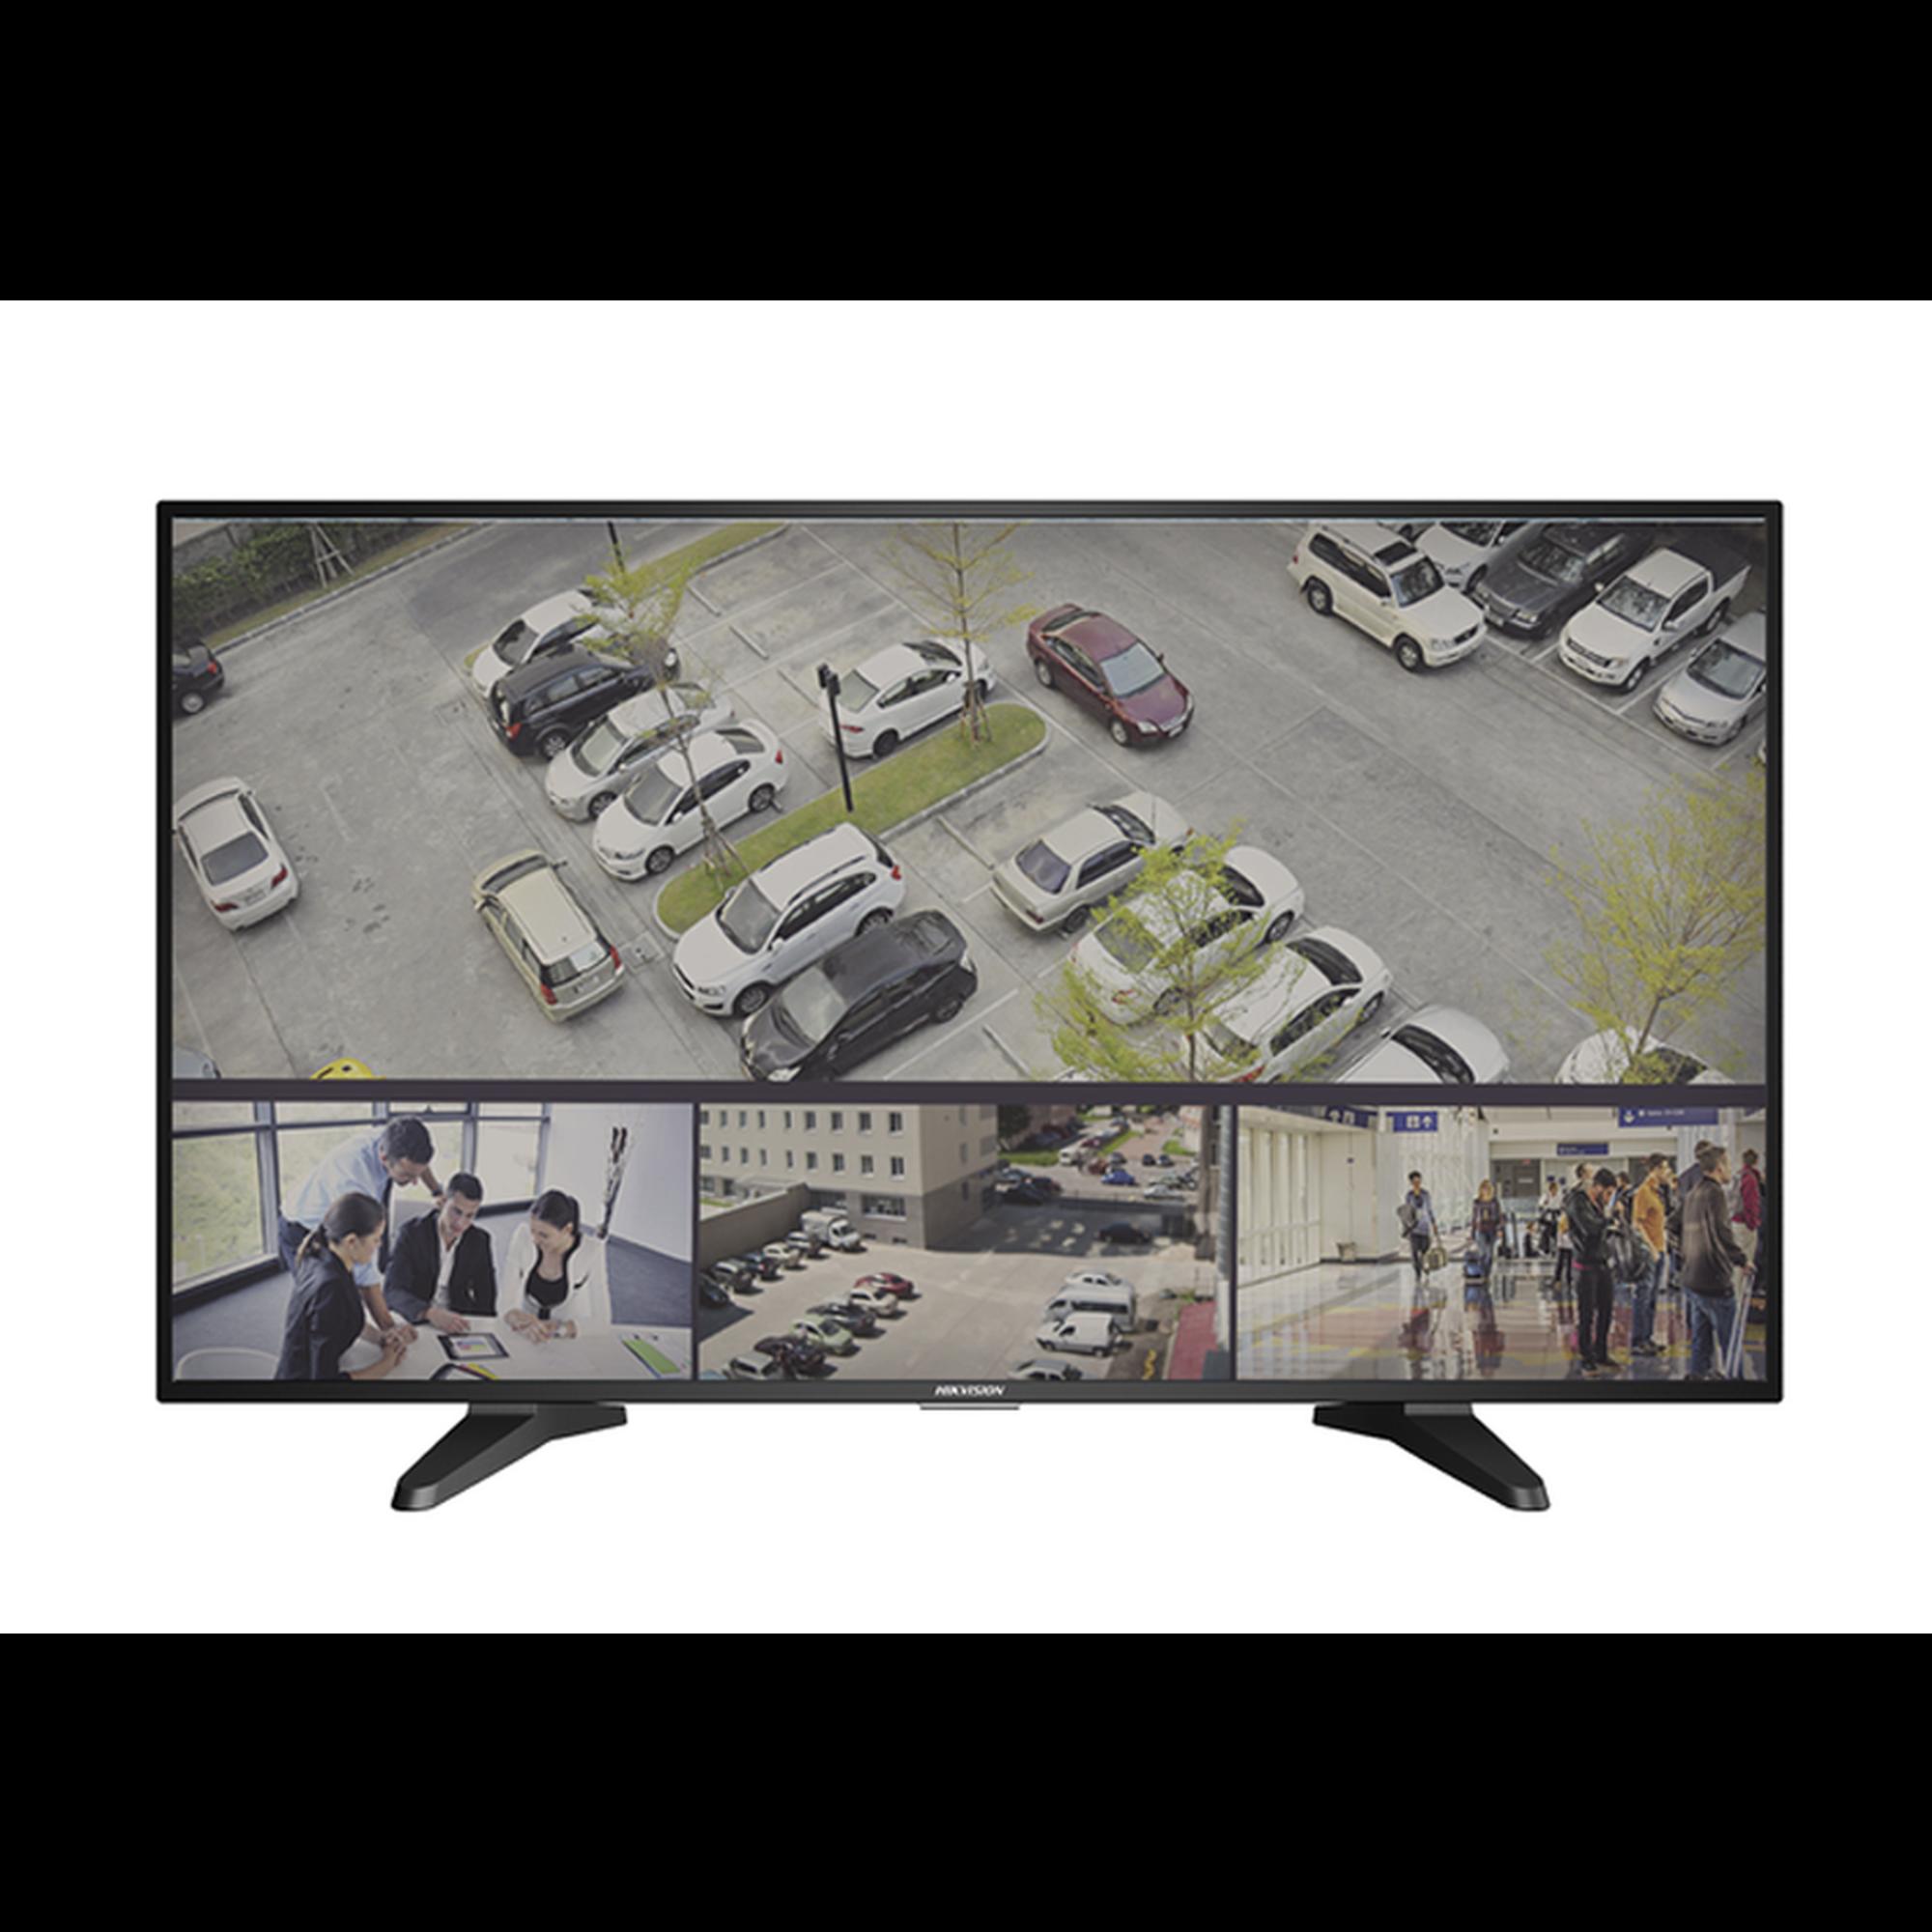 Monitor LED Full HD de 32 / Ideal para Videovigilancia / Uso 24-7 / Entrada HDMI-VGA / Compatible con Montaje VESA